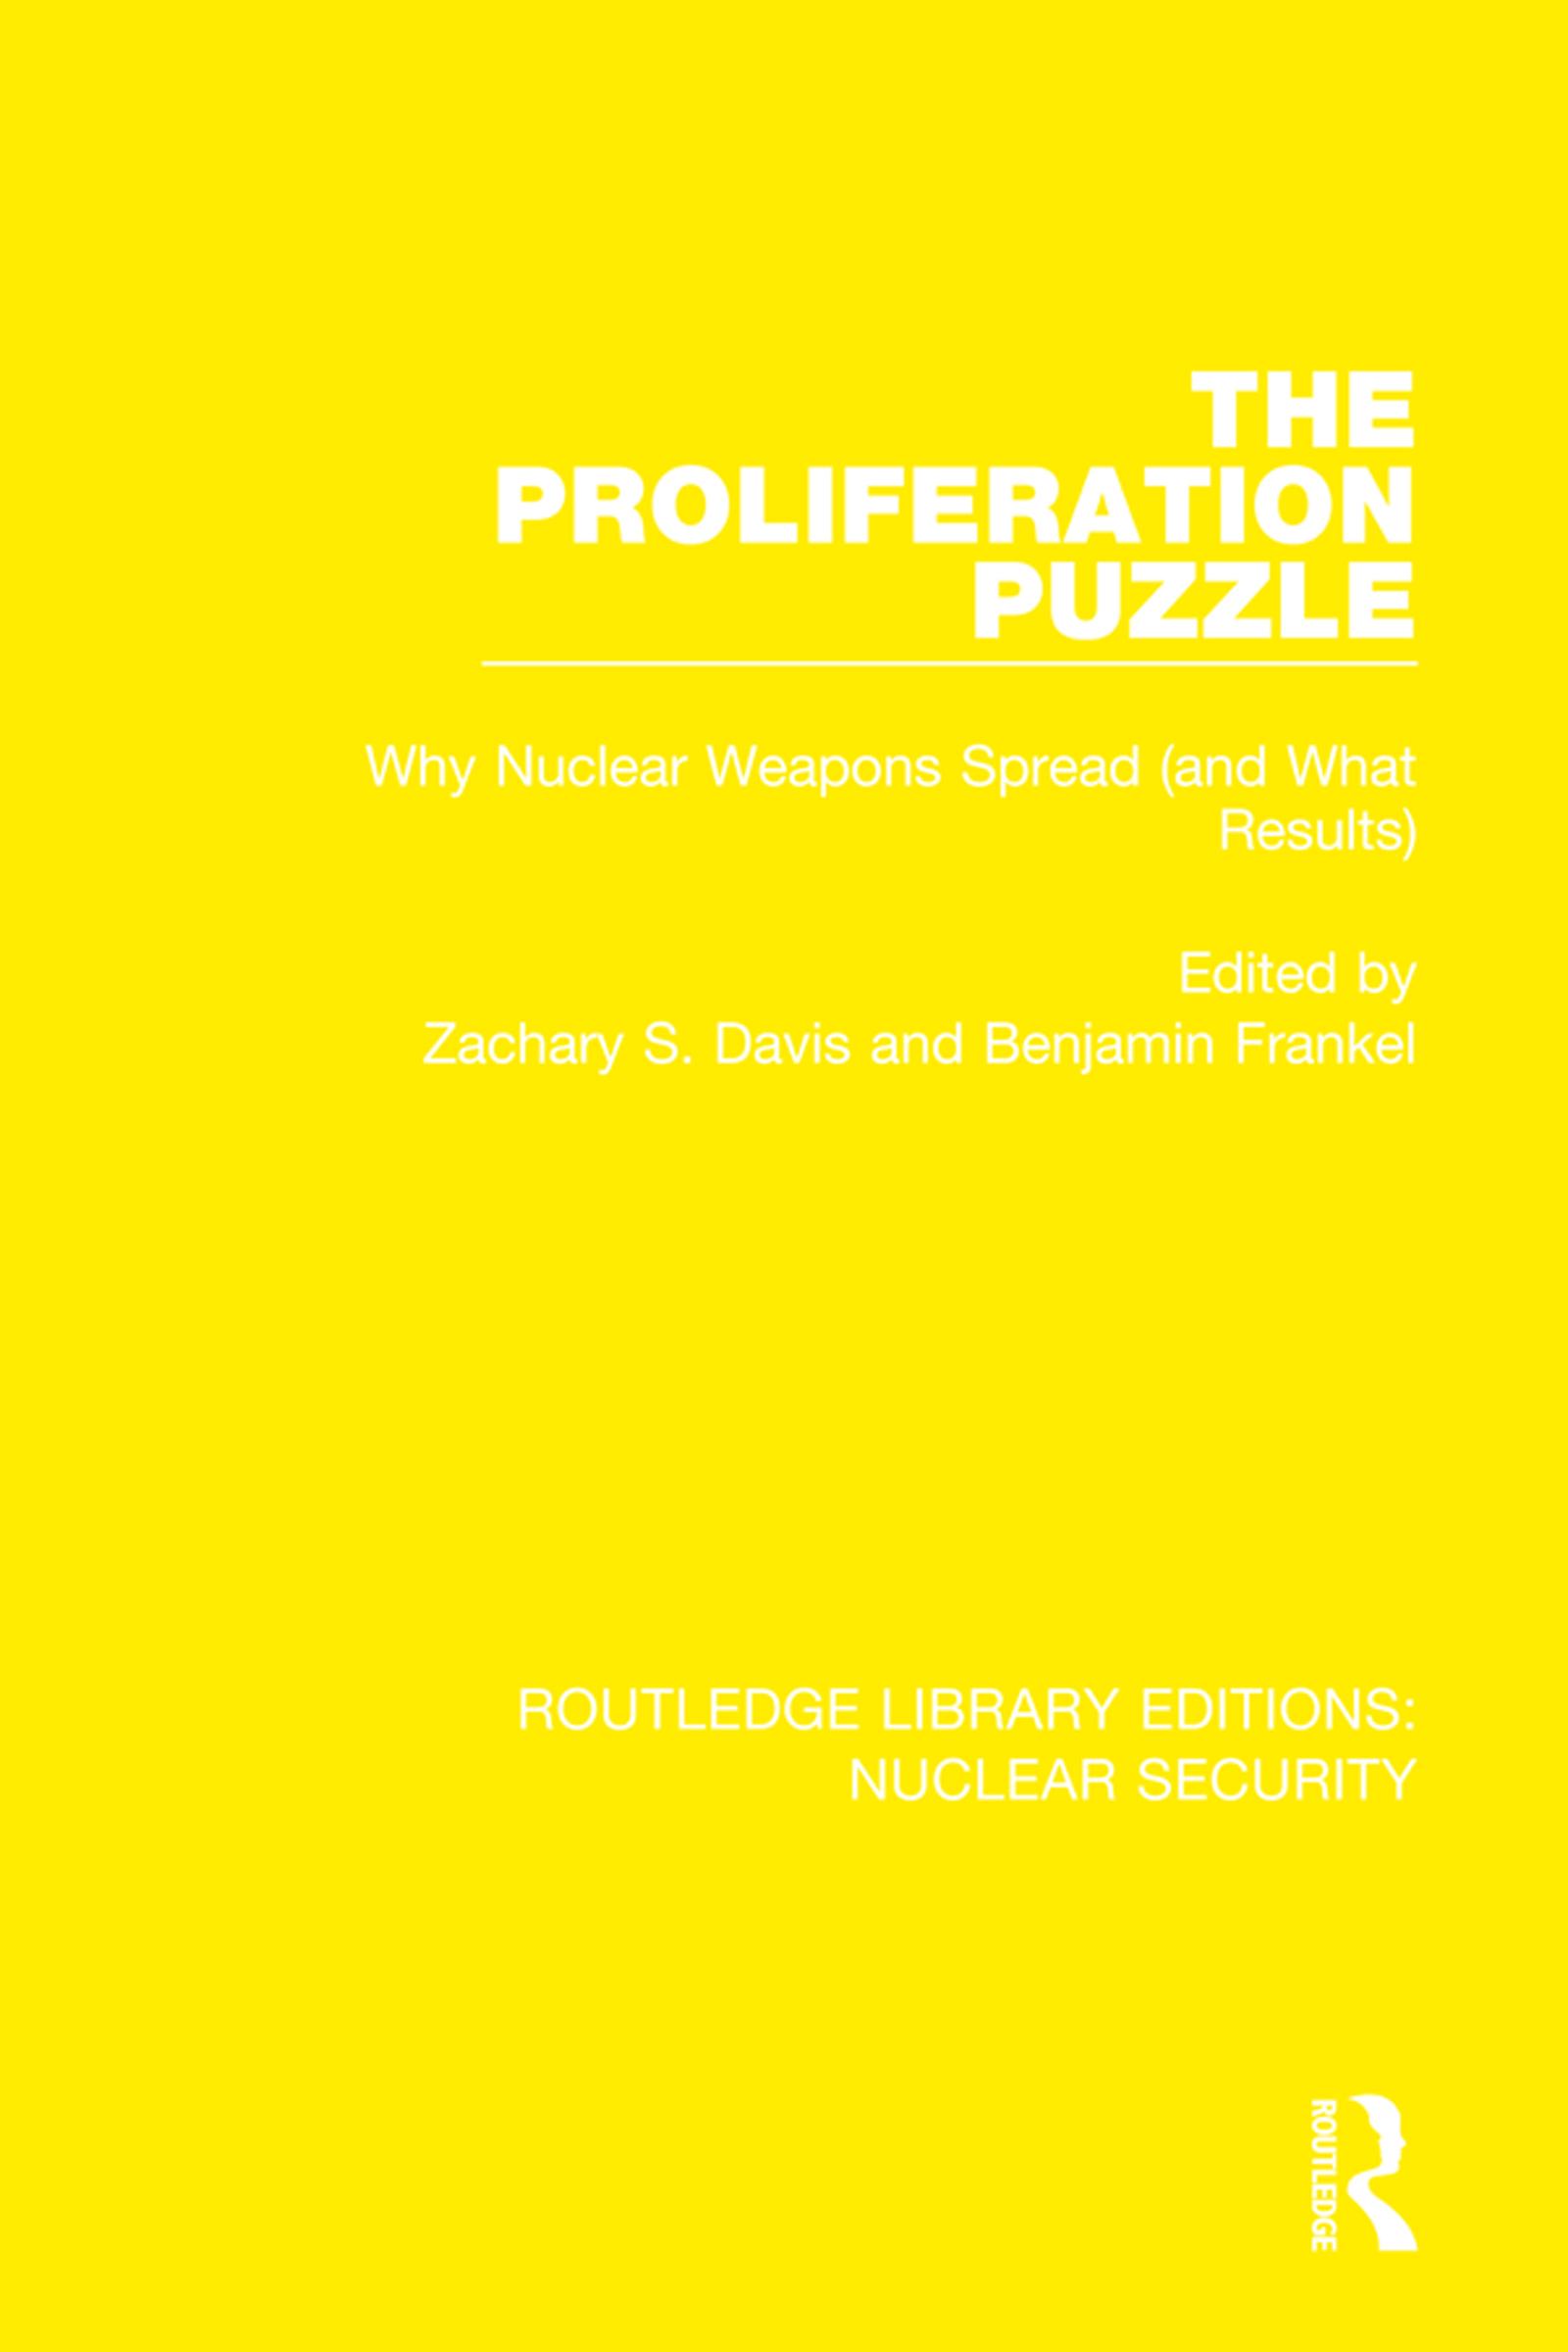 The Proliferation Puzzle